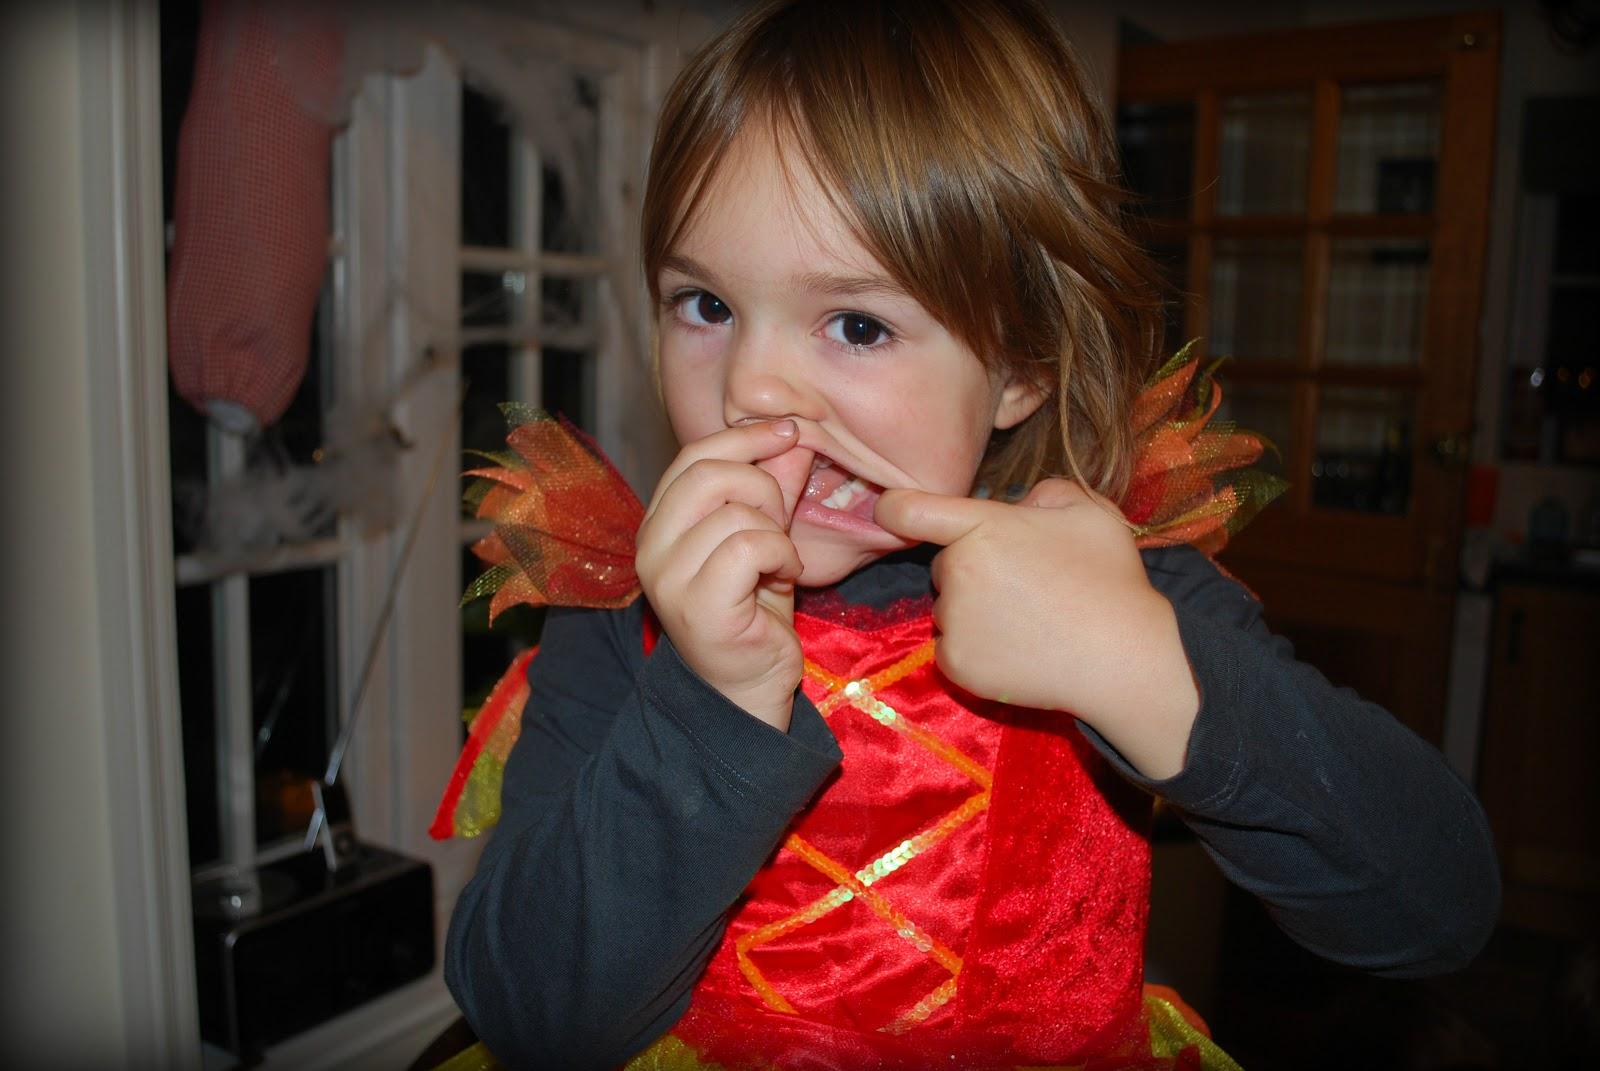 http://3.bp.blogspot.com/-7xx-SAKDsjo/UI27kuKIPlI/AAAAAAAAF-s/DjrNBhdTI2c/s1600/Halloween%2Bdevil%2Bwitch.jpg